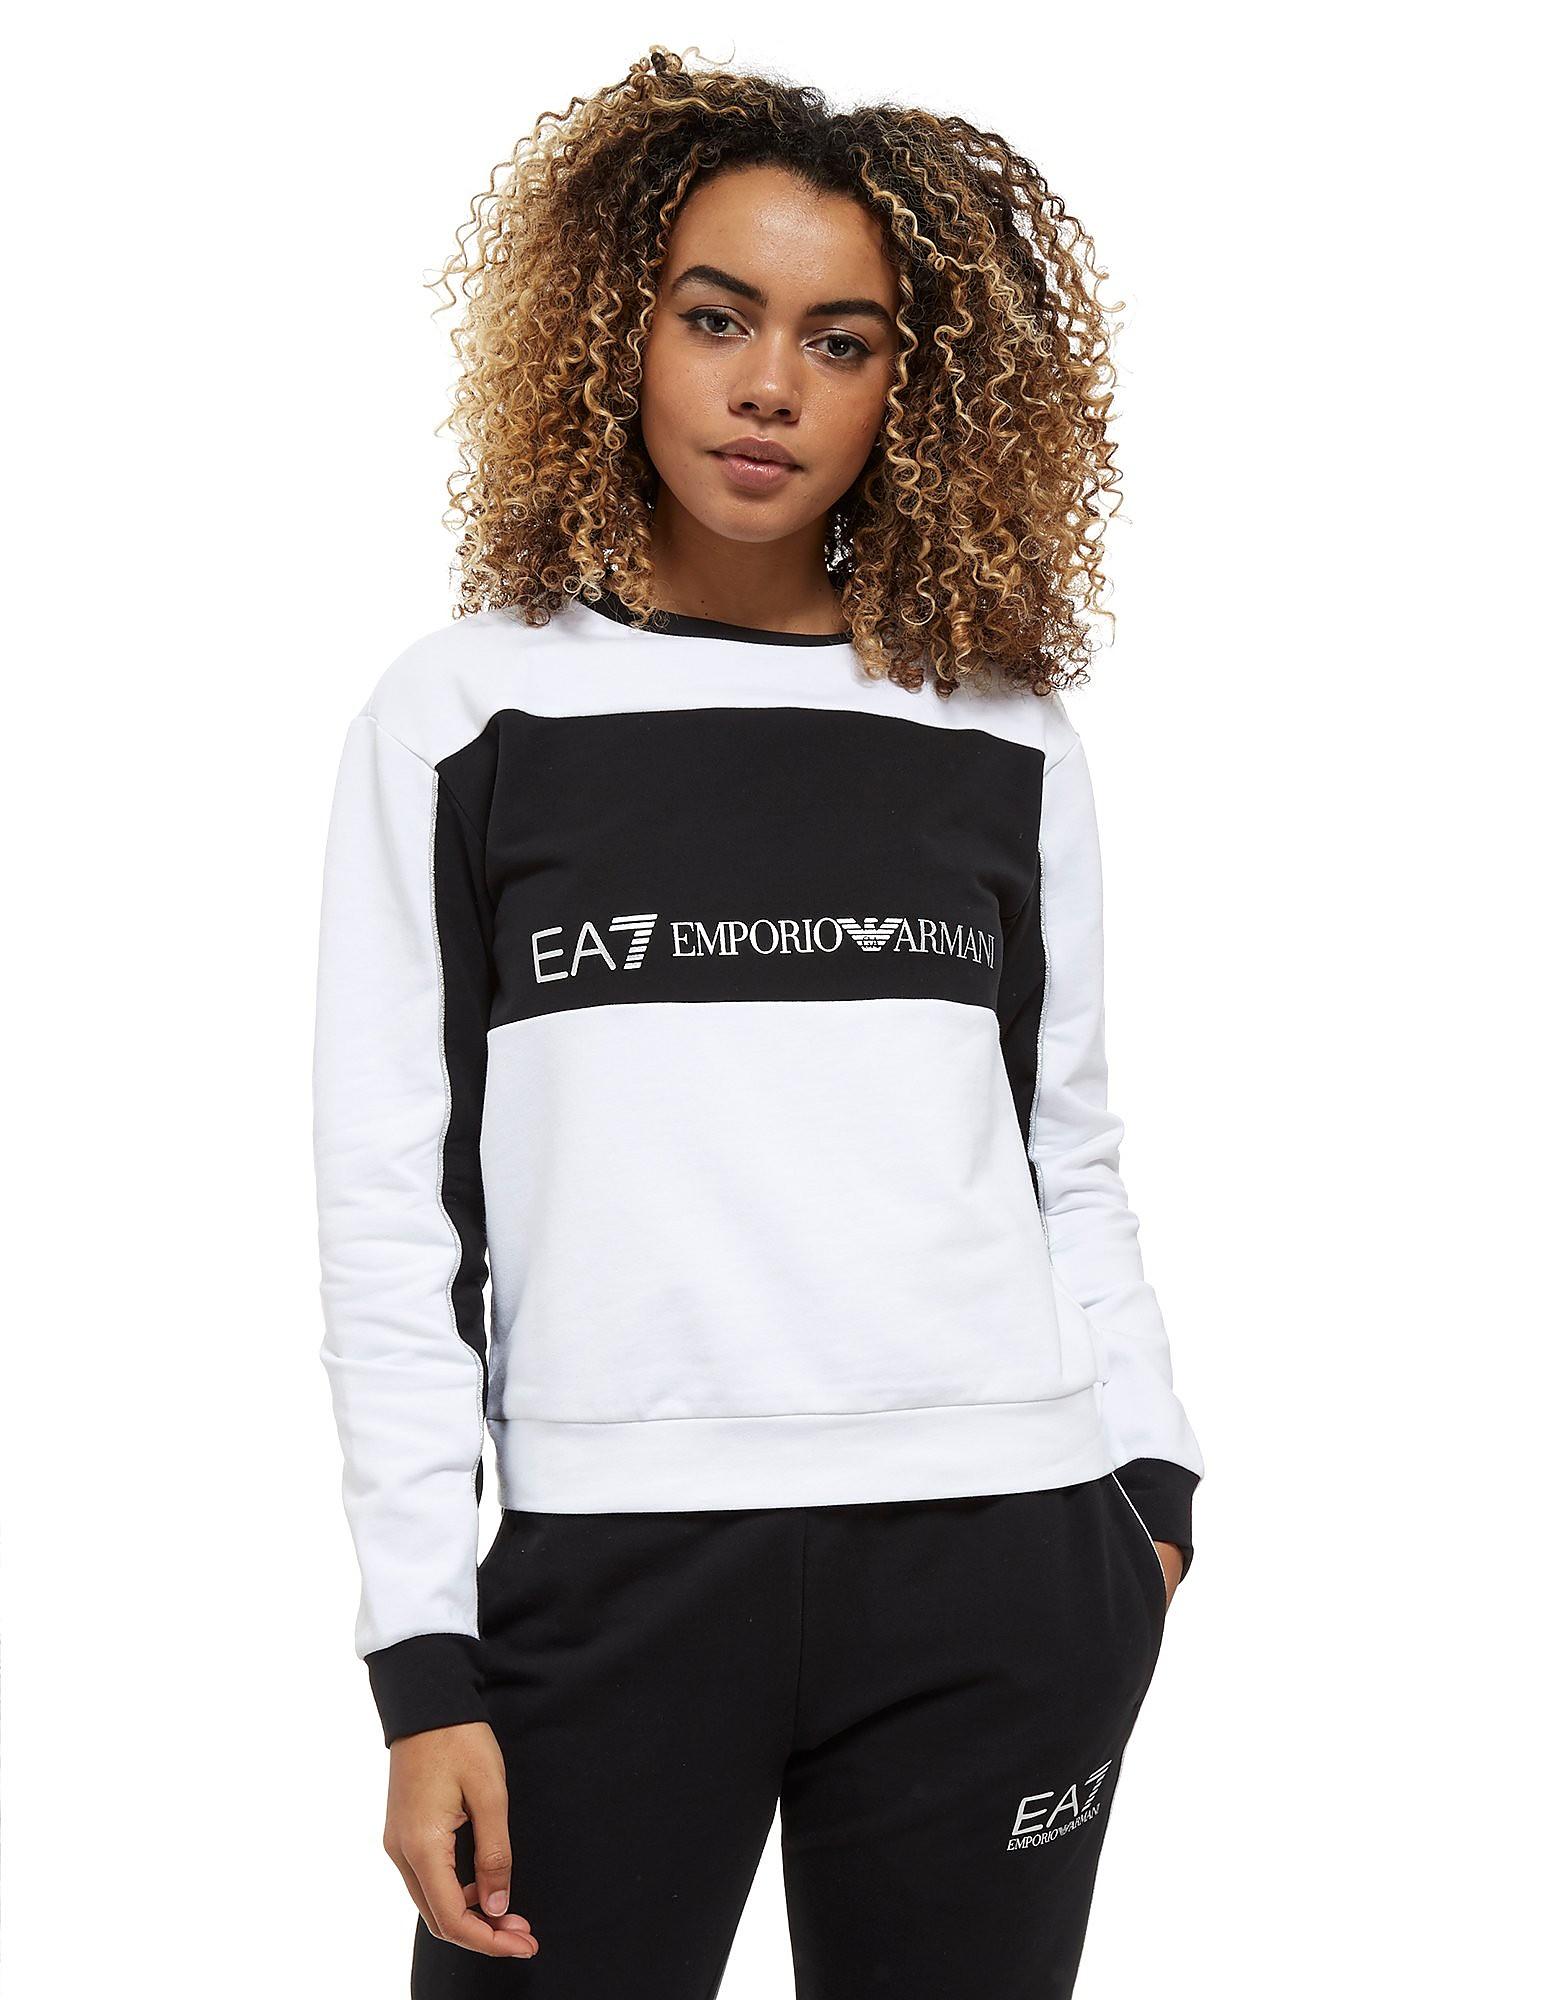 Emporio Armani EA7 Panel Crew Sweatshirt